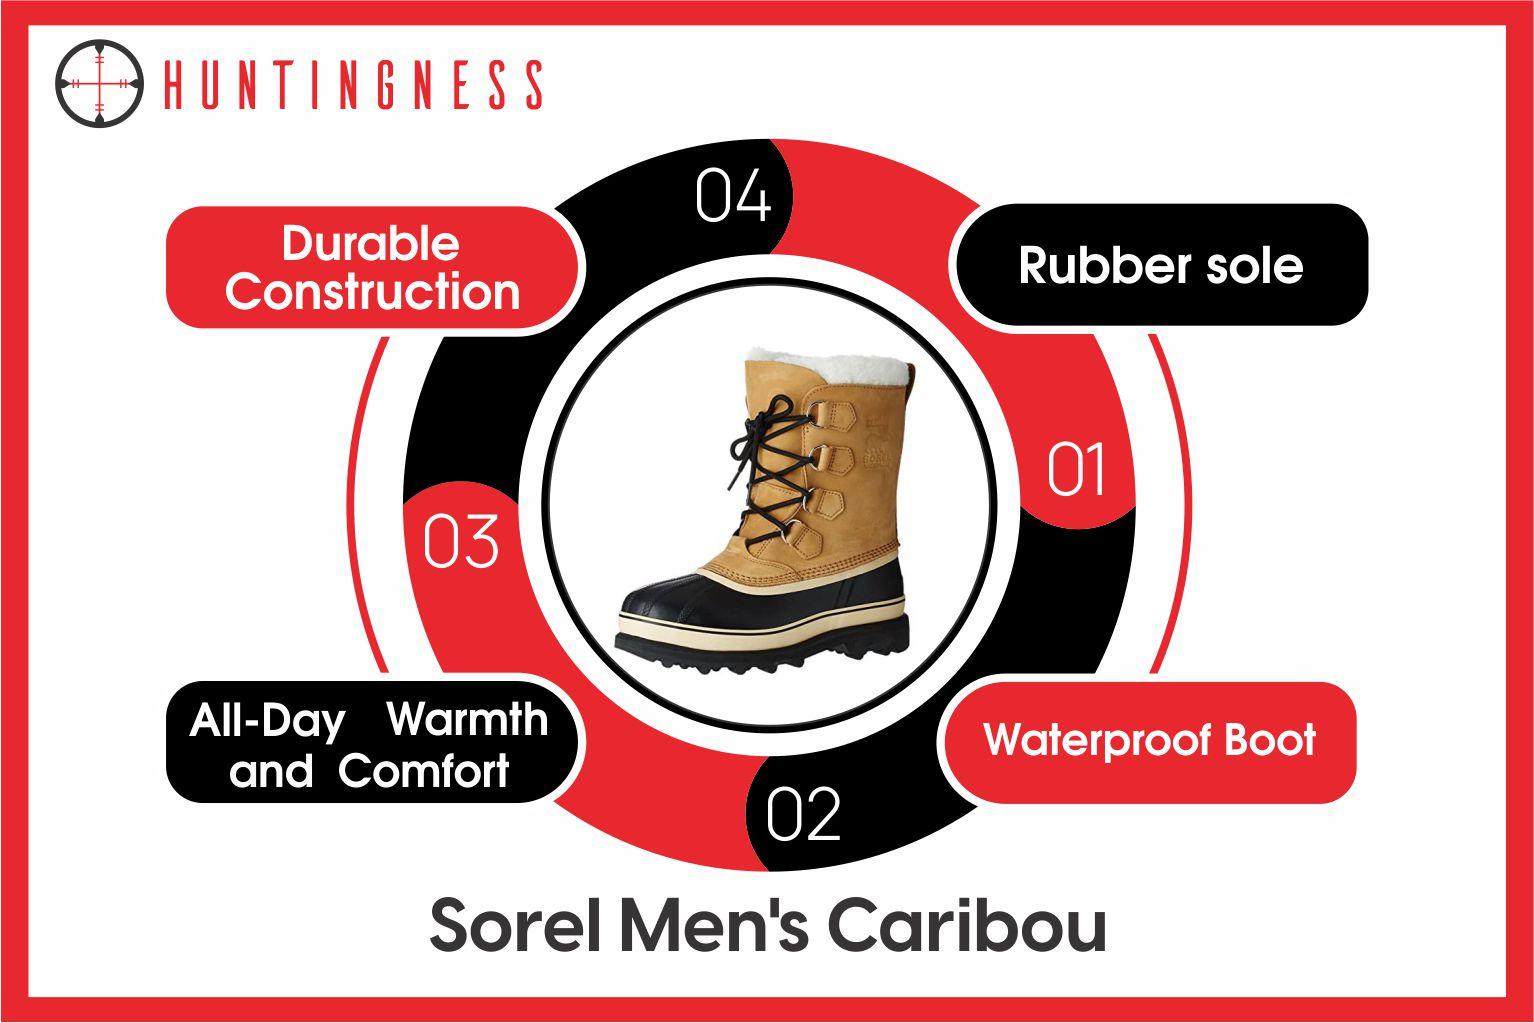 SOREL Men's - Best Caribou Hunting Boots Infographics